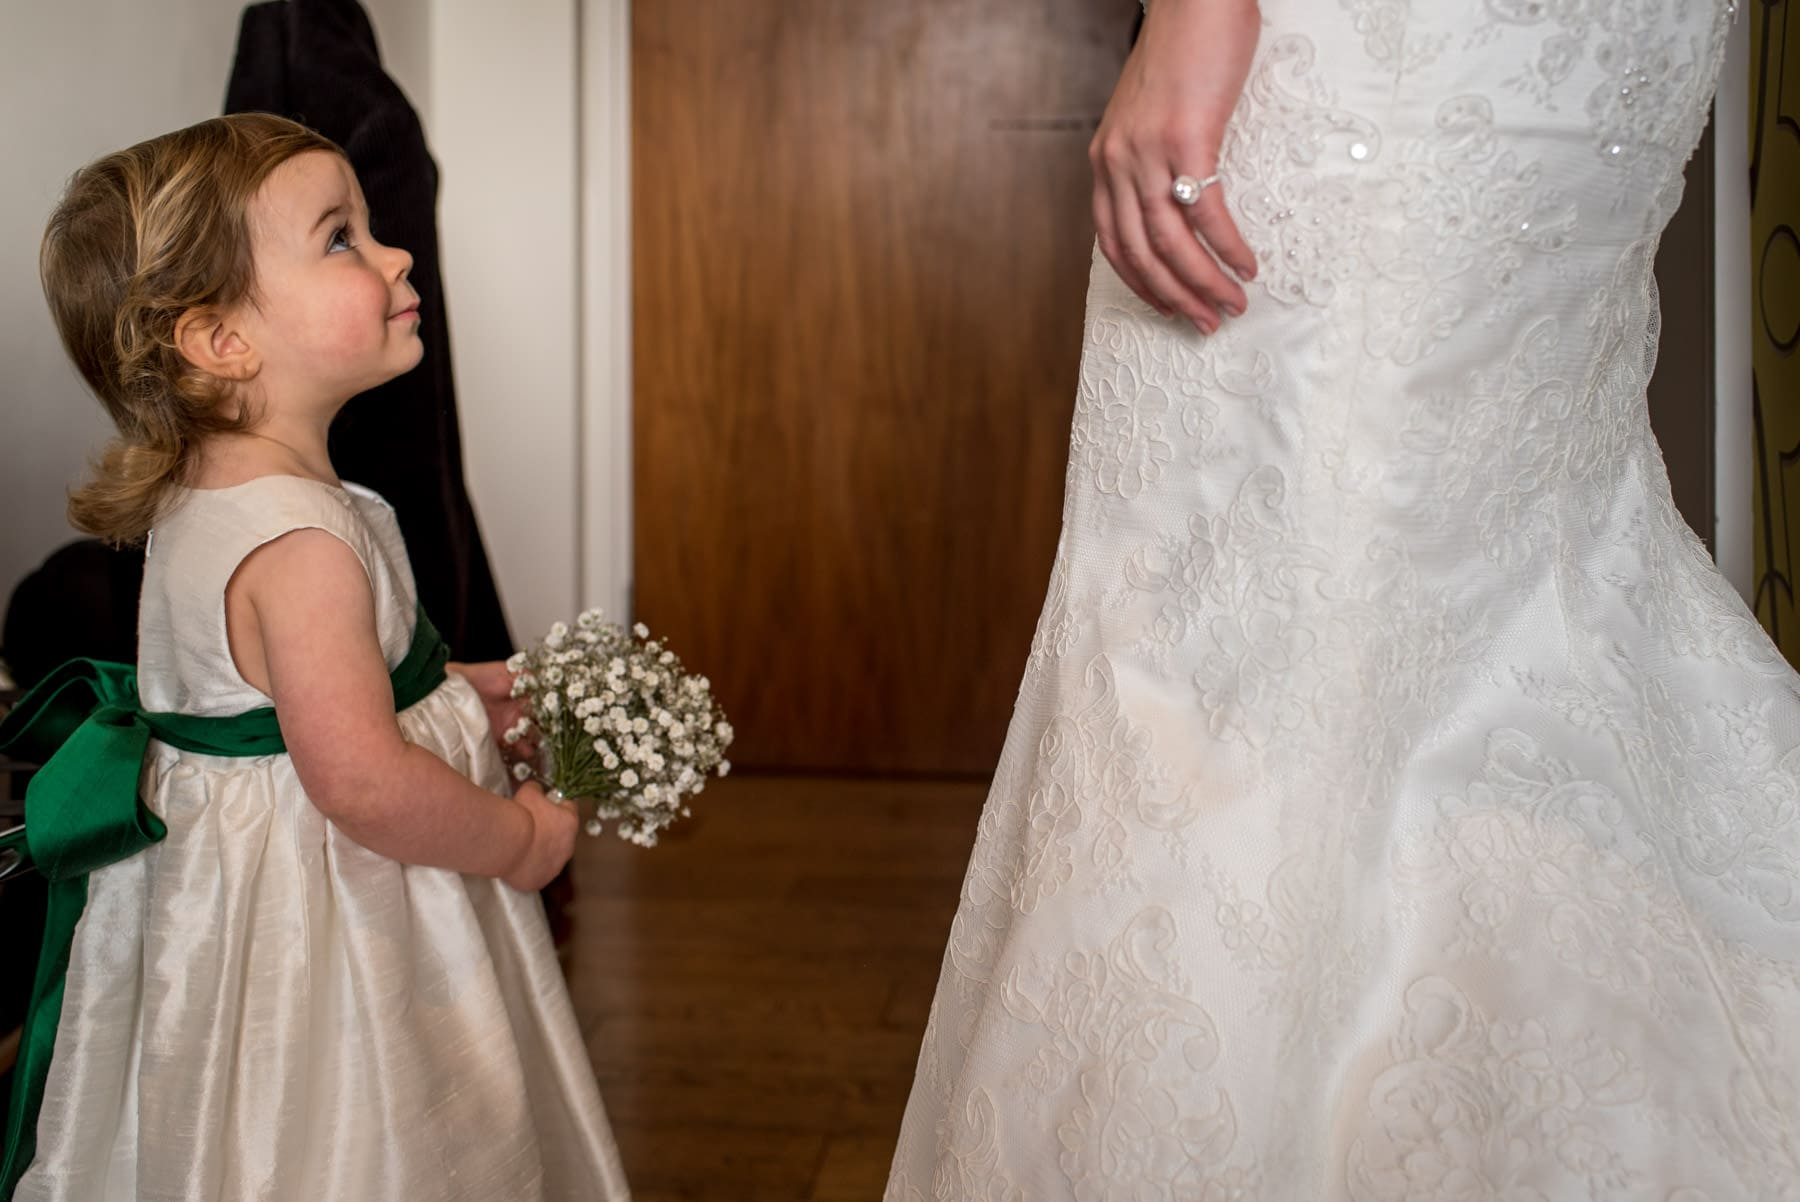 flower girl admiring the brides wedding dress